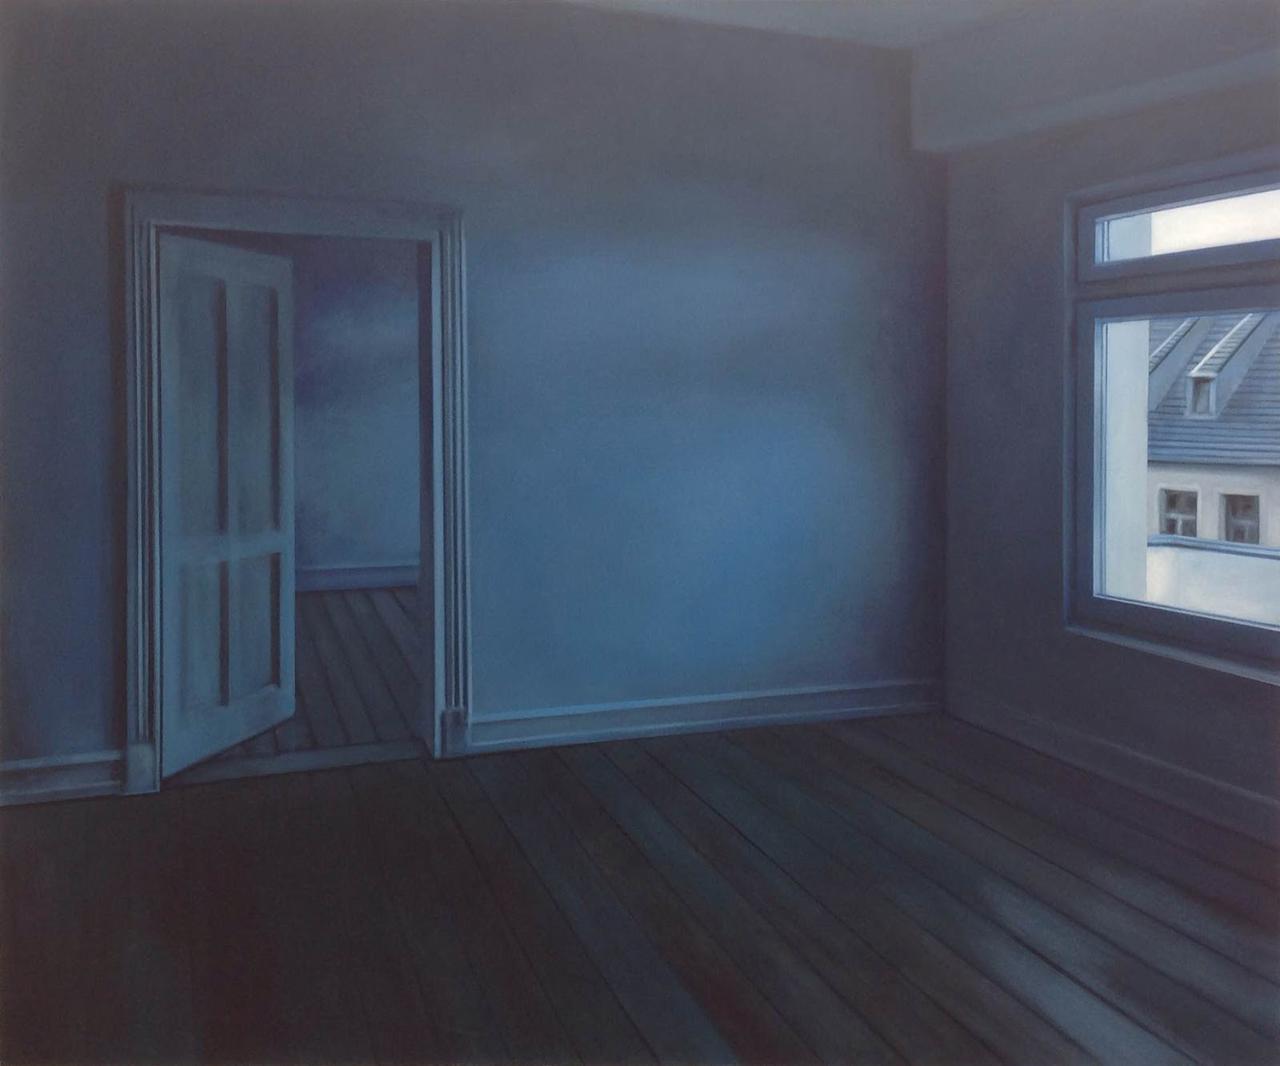 The apartment, oil on canvas, 150 x 180 cm, 2016